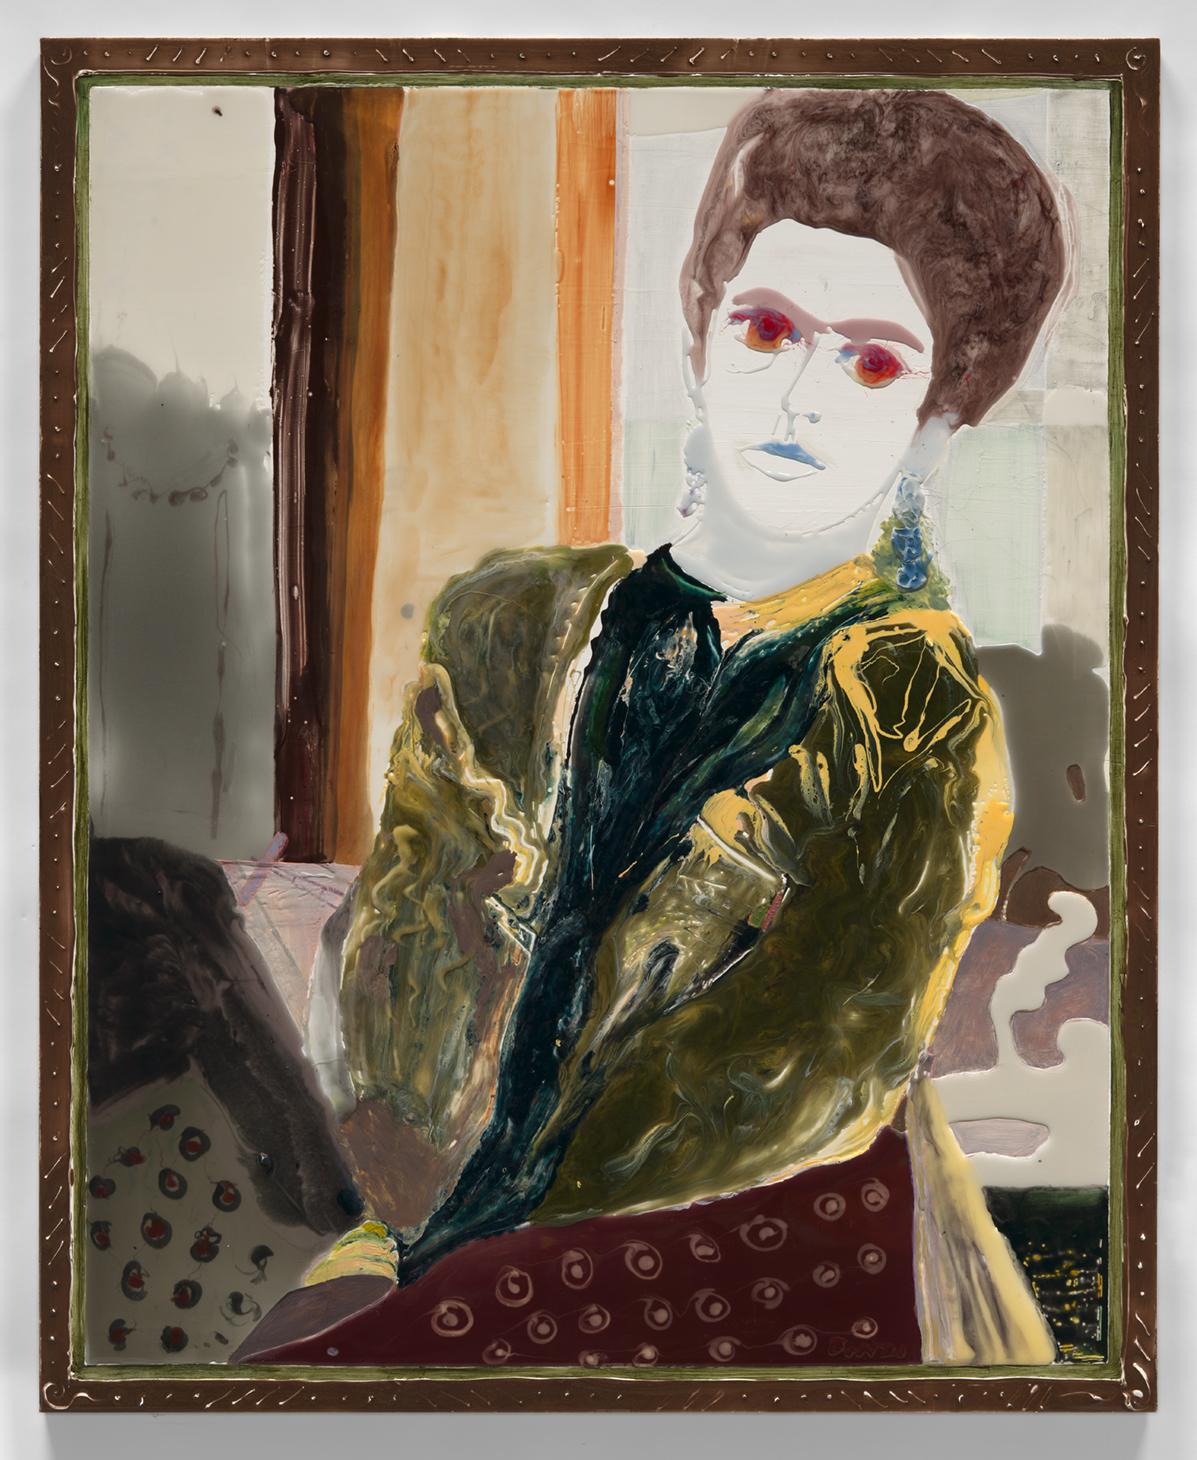 Eric Finzi — Linda Warren Projects: Fine Art Gallery